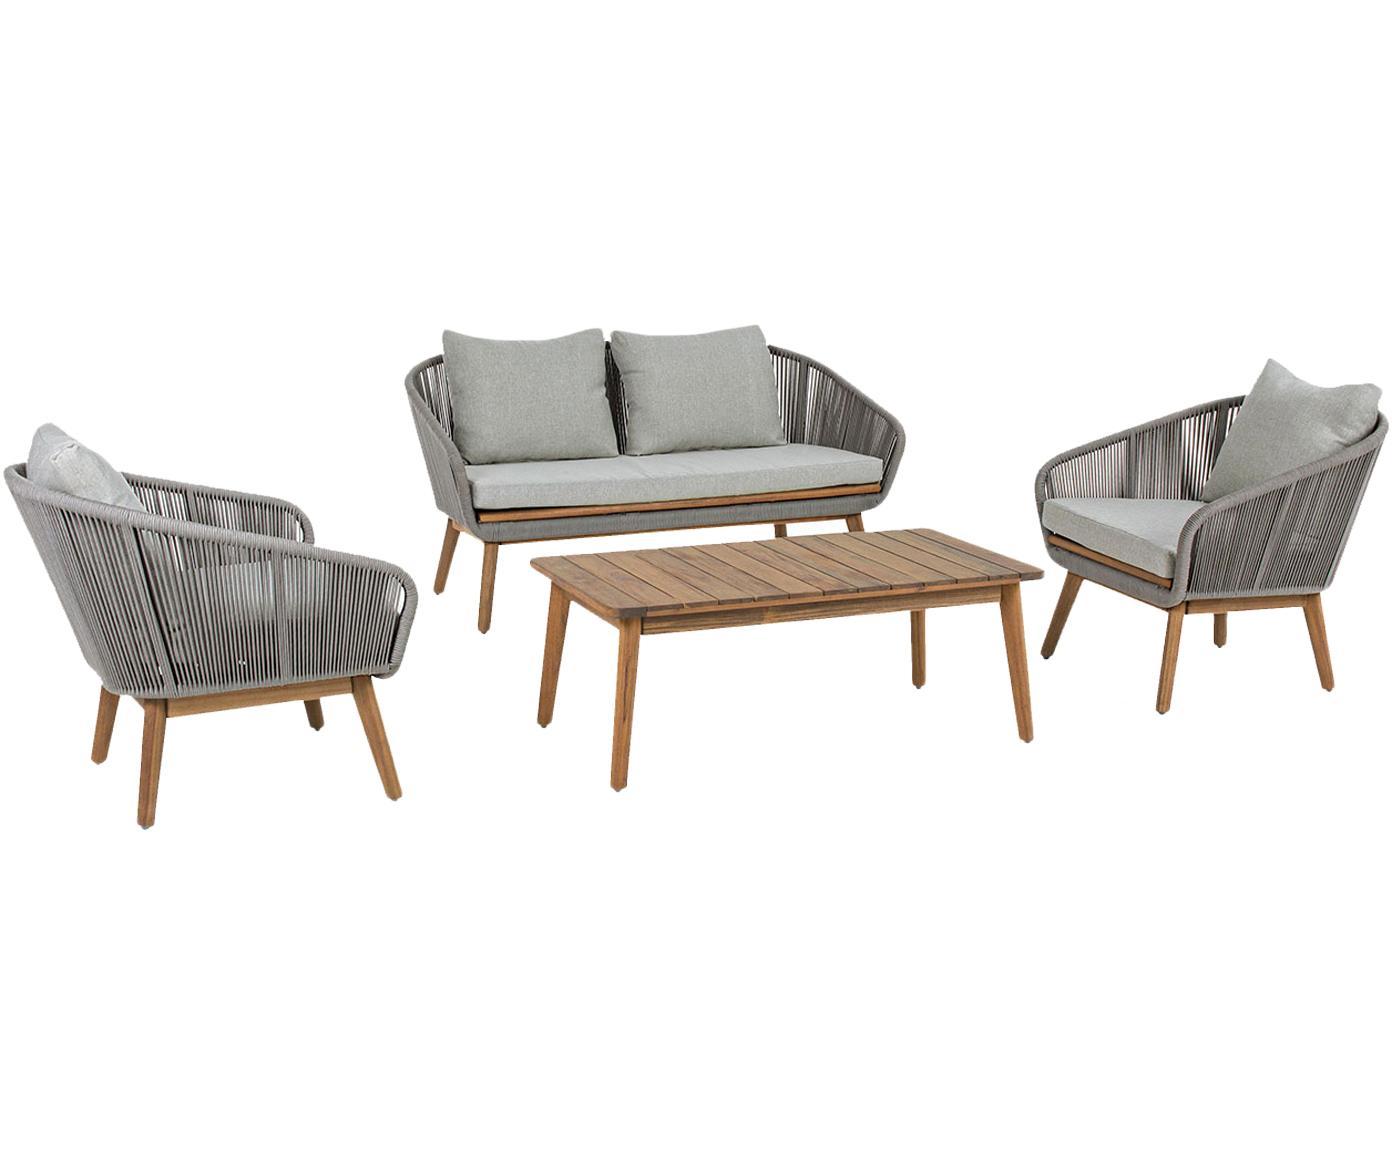 Set lounge de exterior Annecy, 4pzas., Madera, textil, Beige, Tamaños diferentes